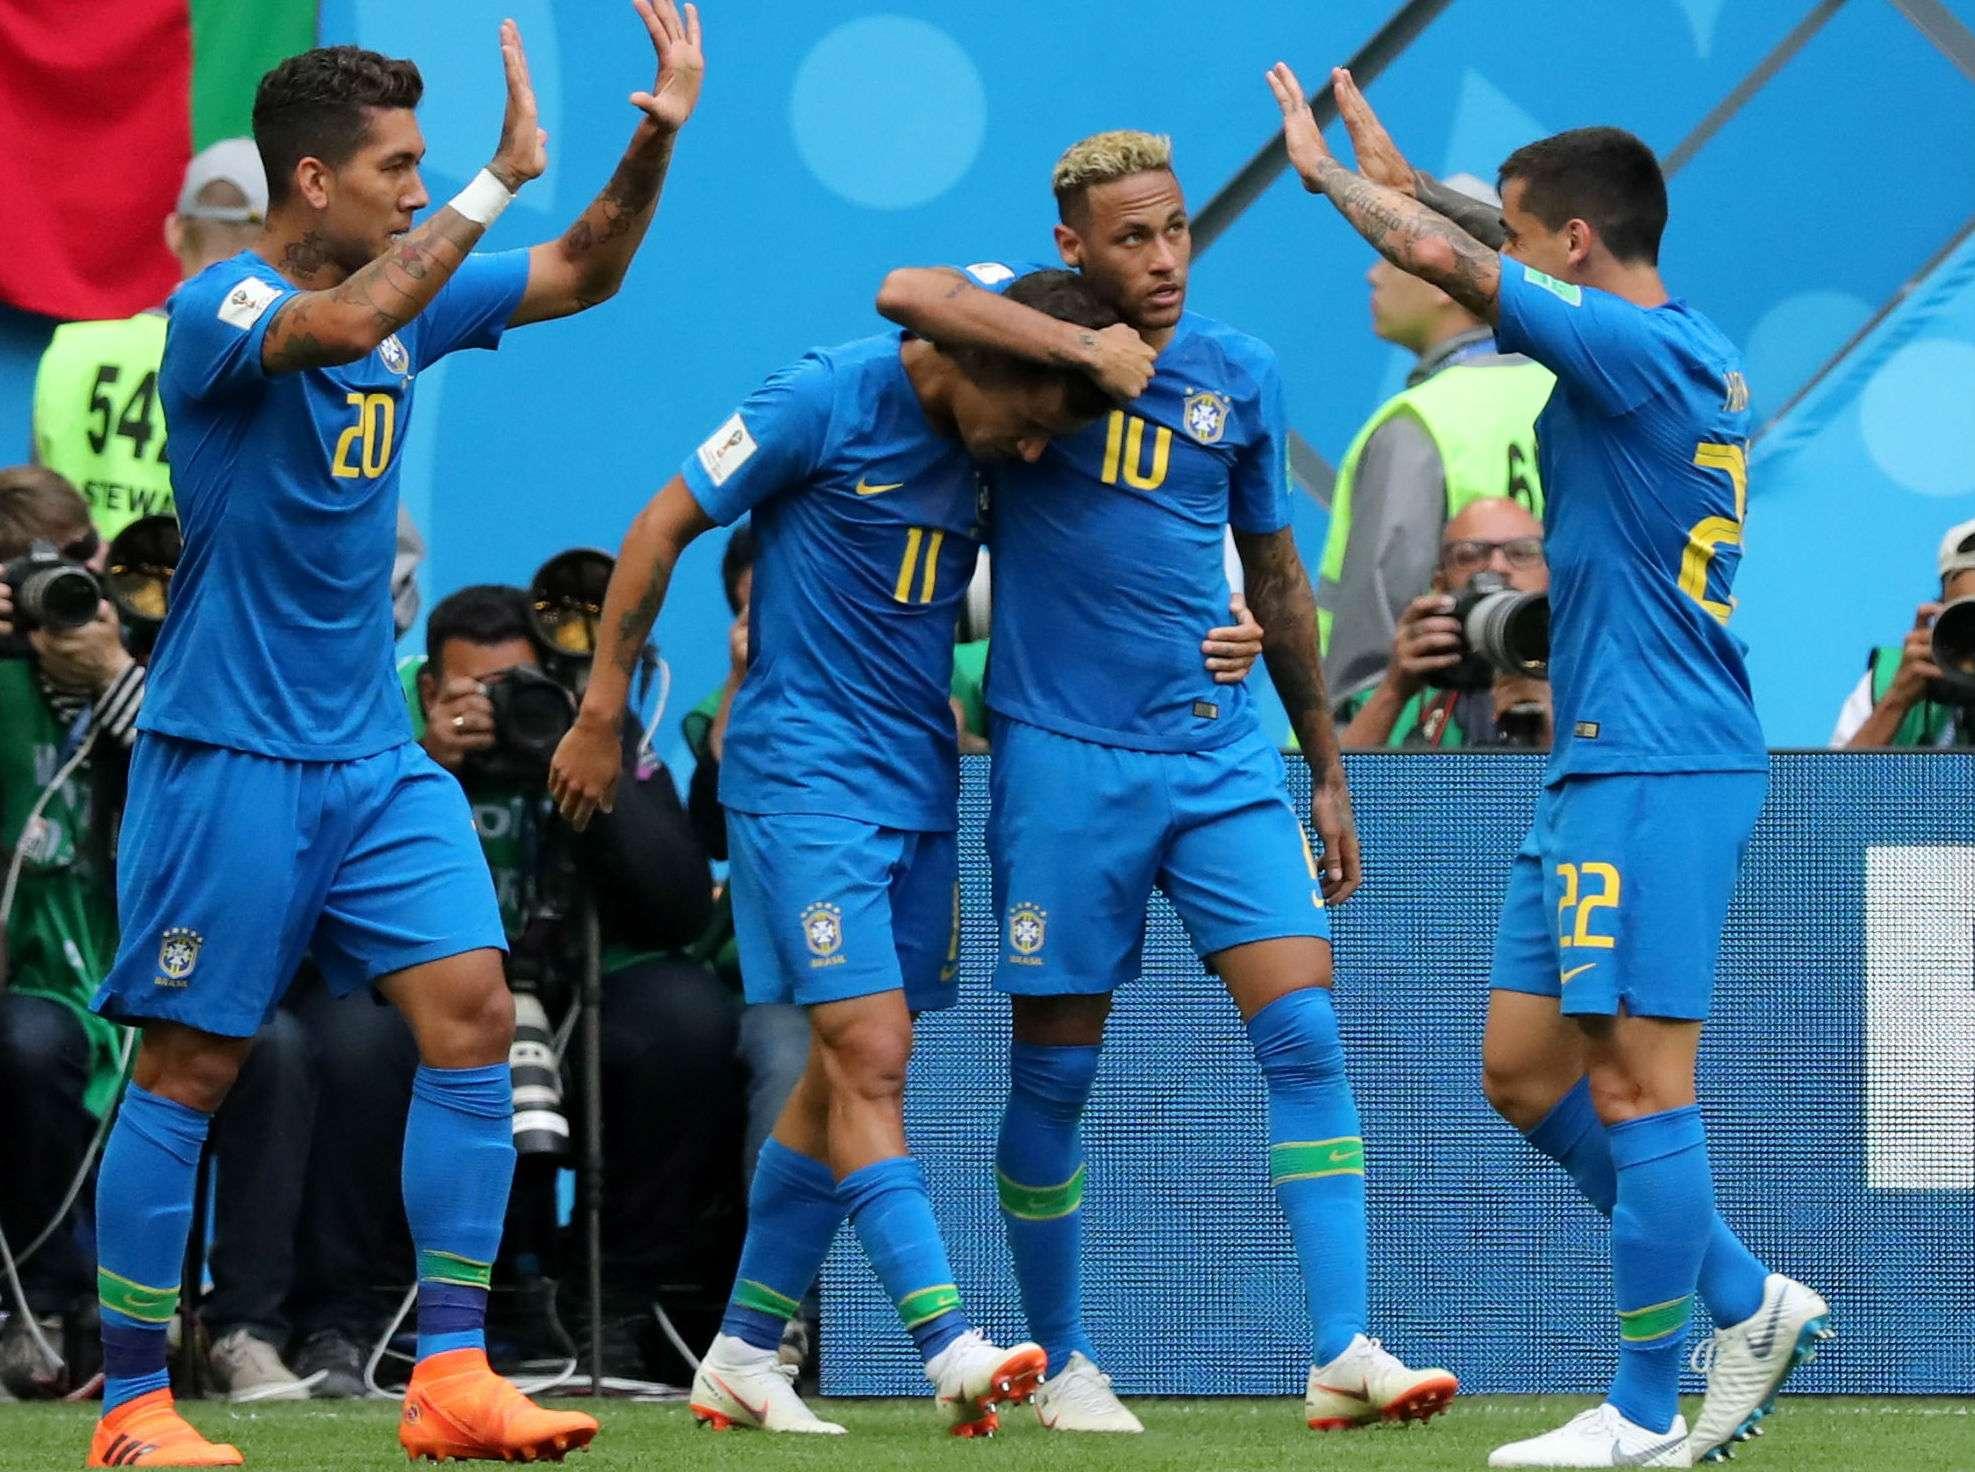 Brasil le ganó 2-0 a Costa Rica. Foto:EFE